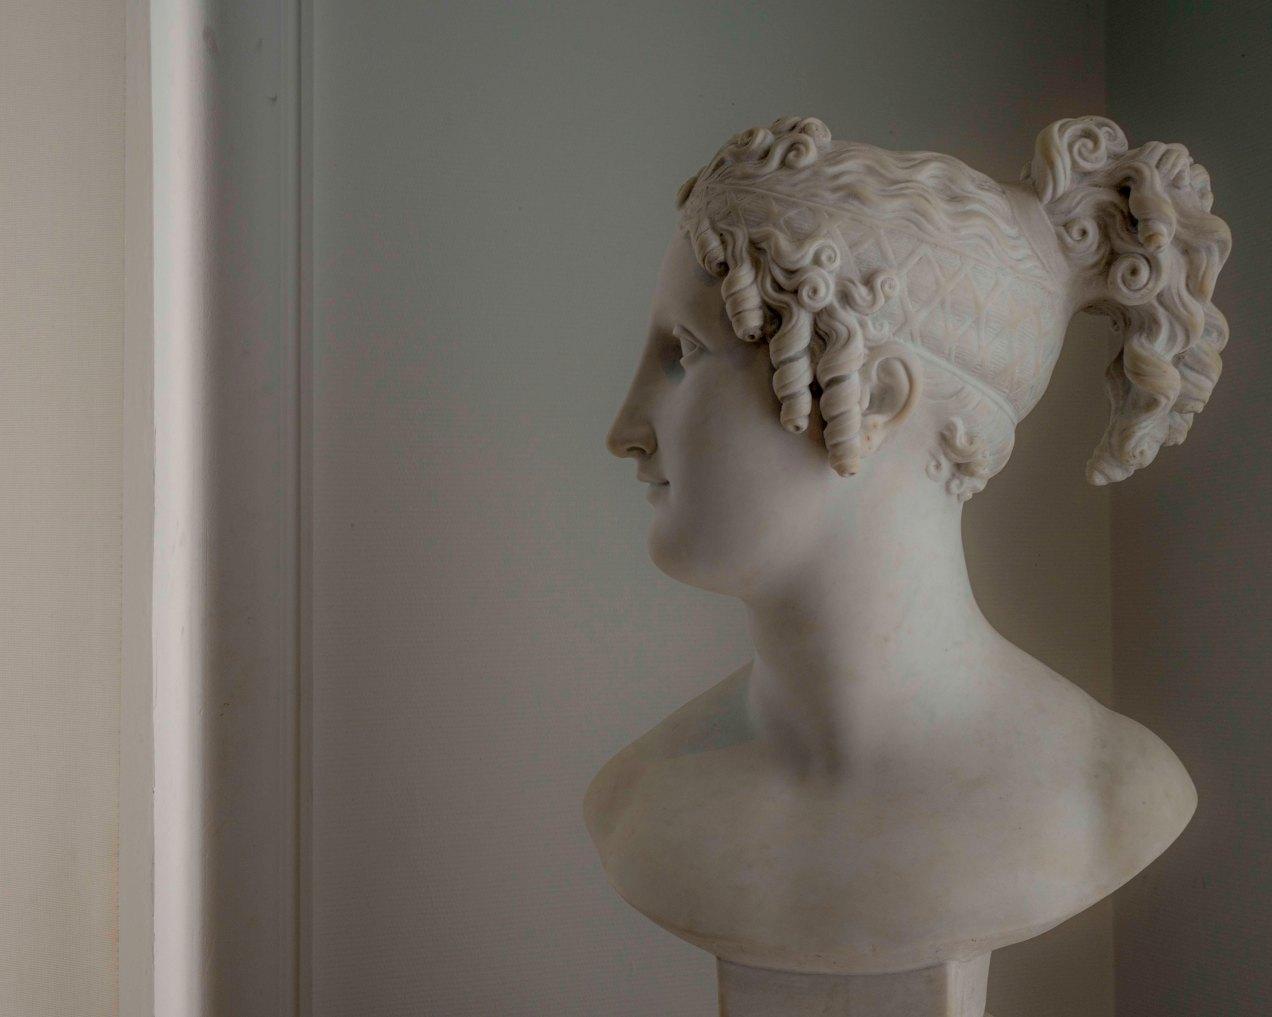 Pauline de profil, Antonio Canova, palais Masséna, gildalliere, Nice, 2019